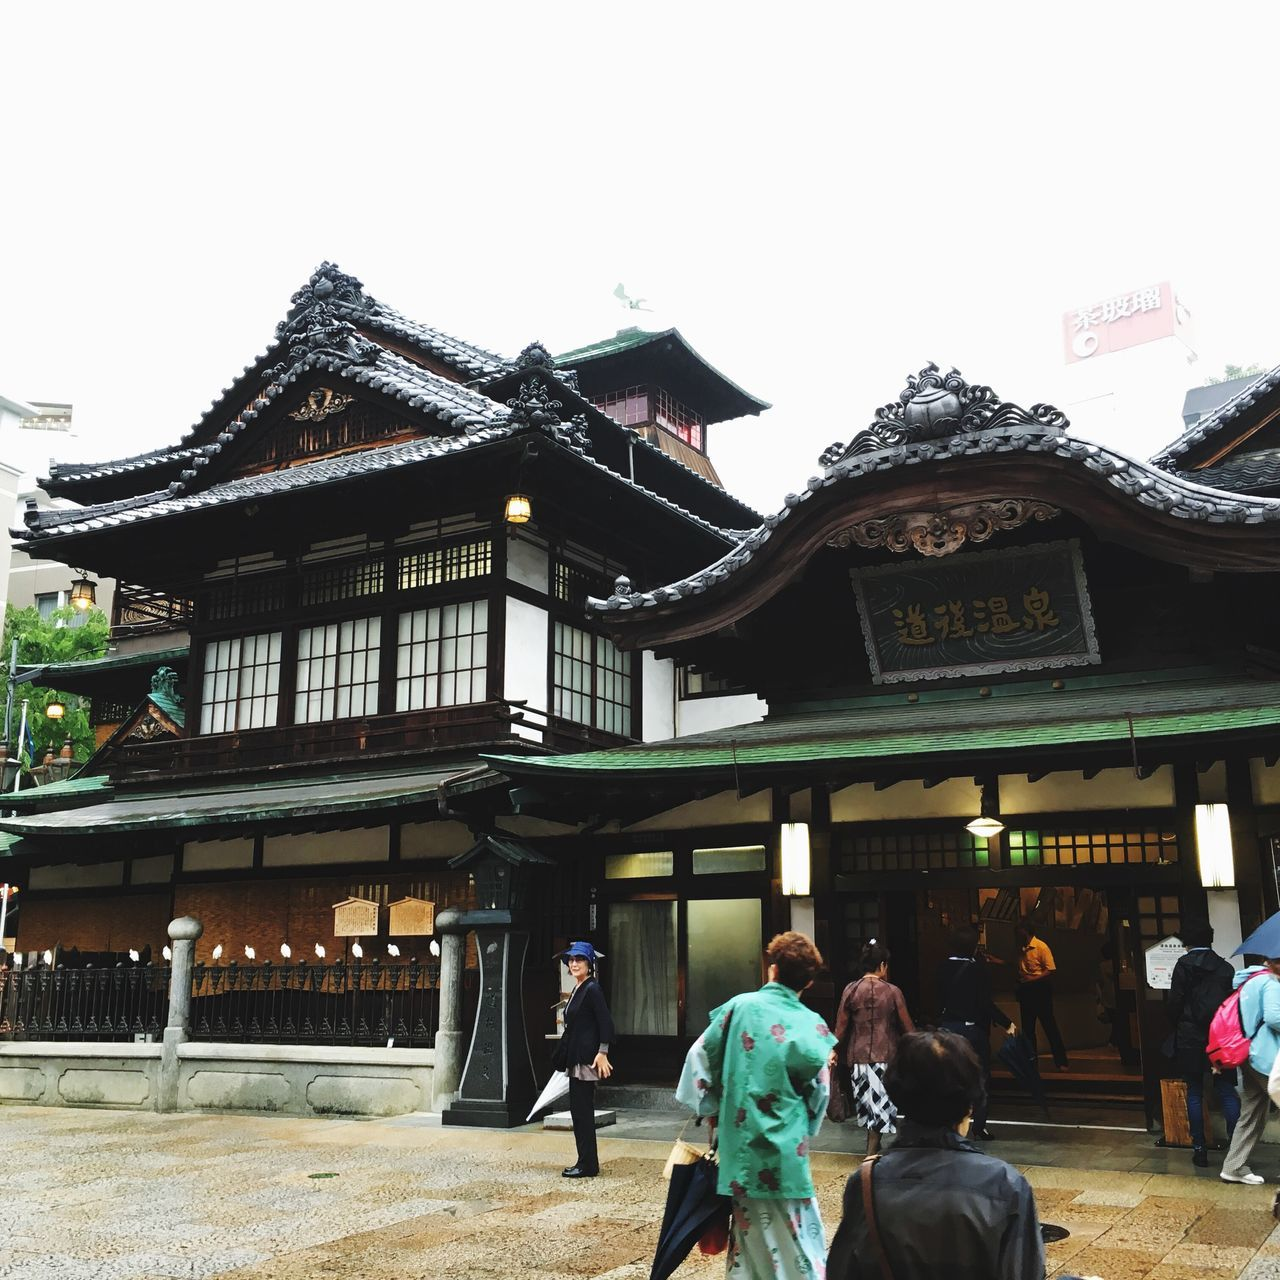 Hot Spring 温泉 Dogo Onsen 道後温泉 Japan Japanese